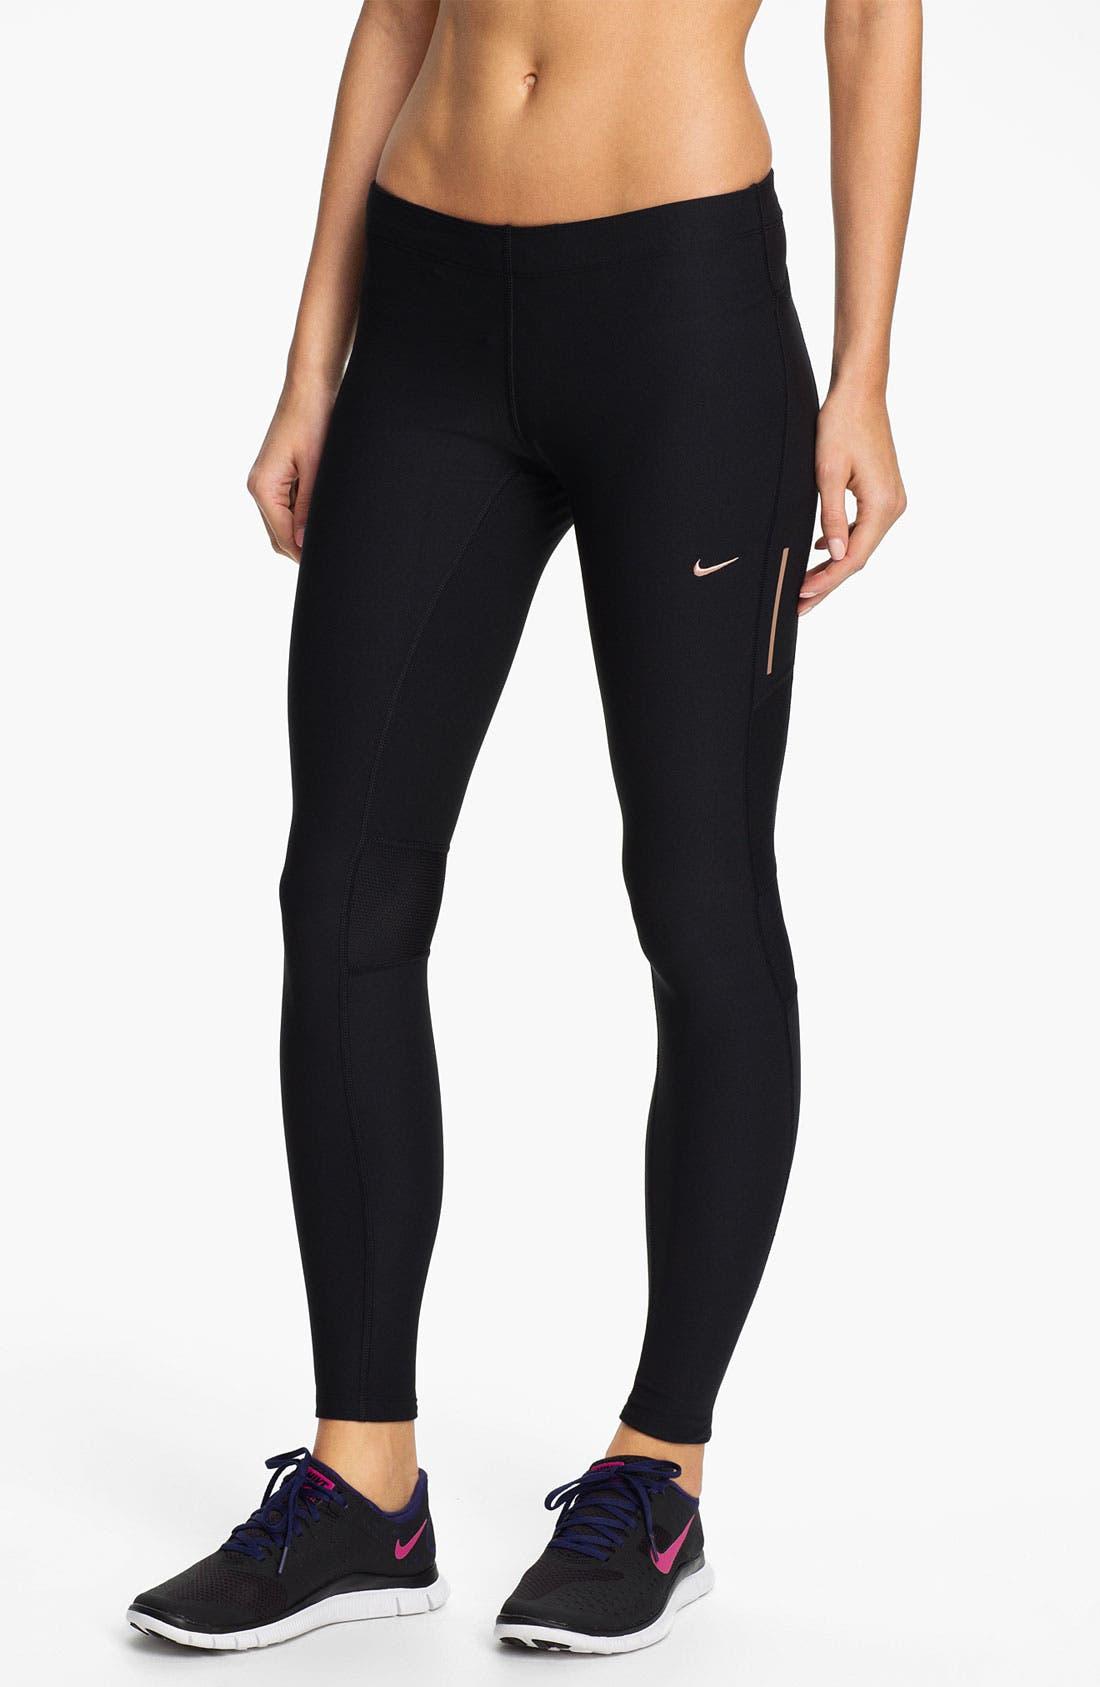 Main Image - Nike 'Tech' Tights